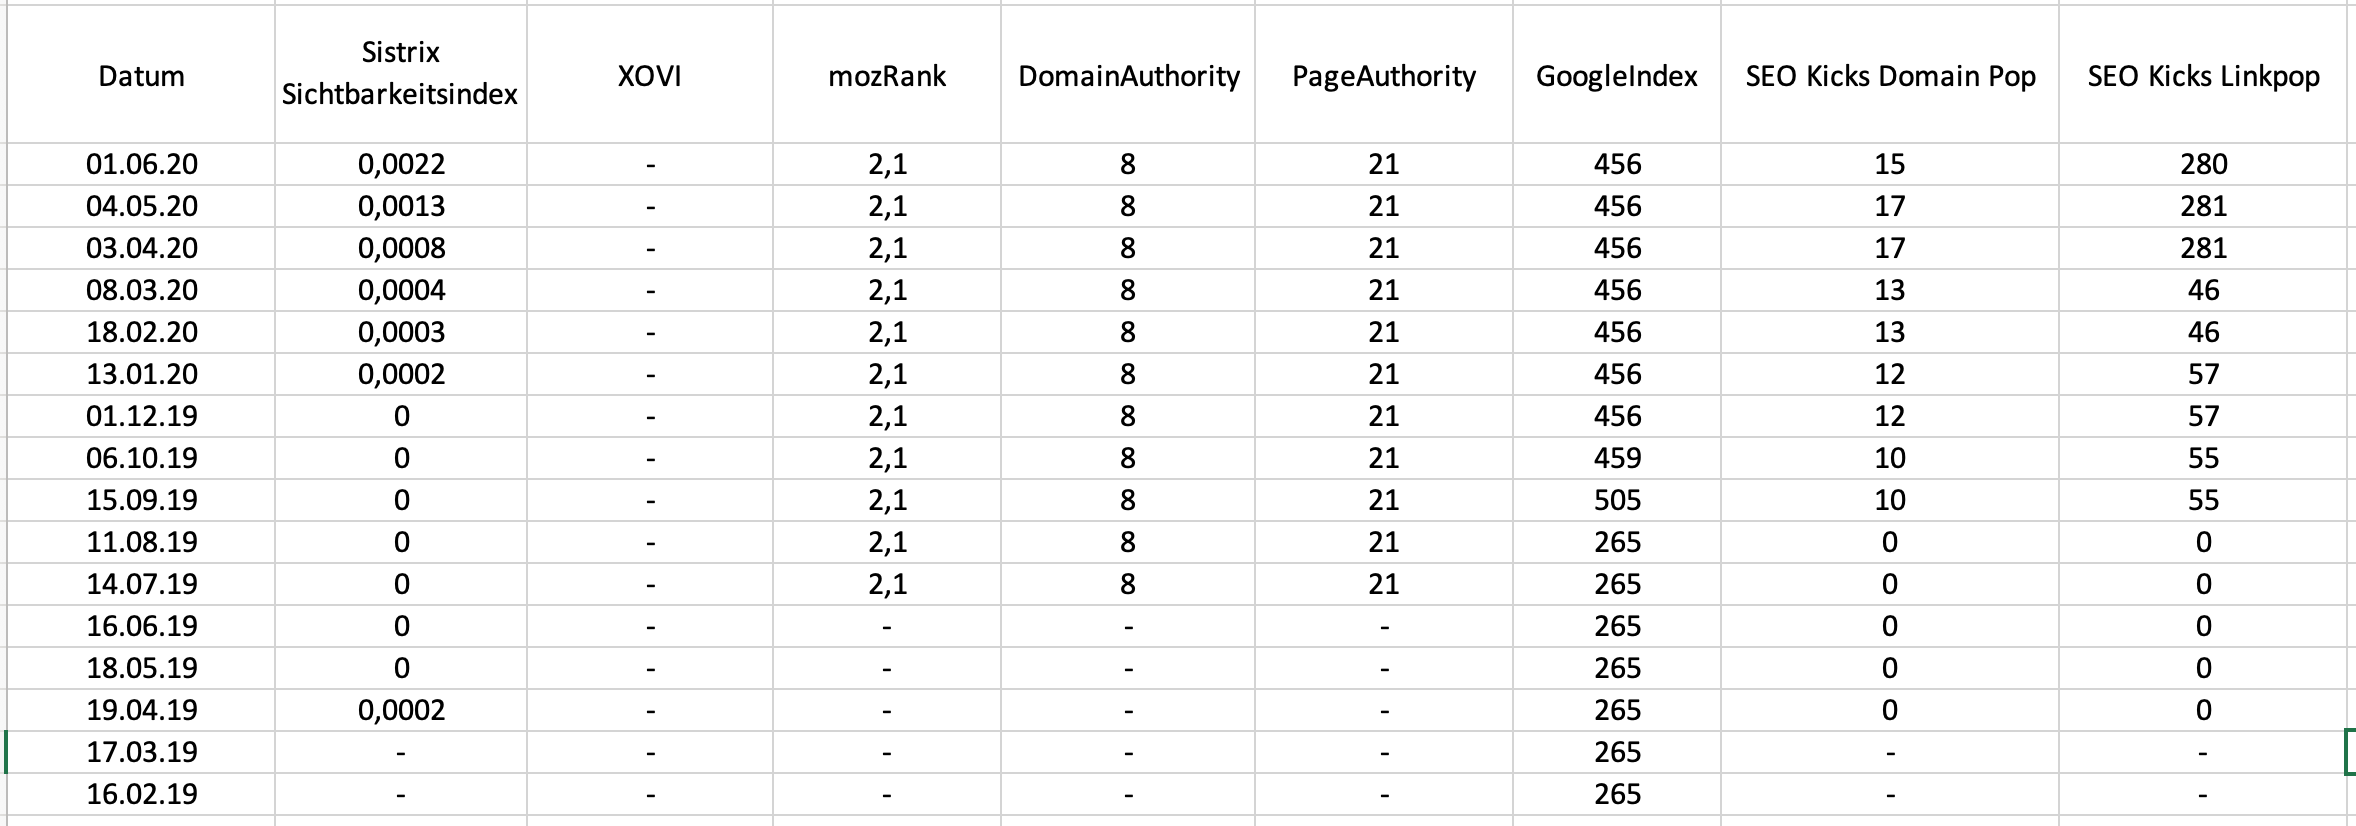 SEO-Statistik von Blogmission.com